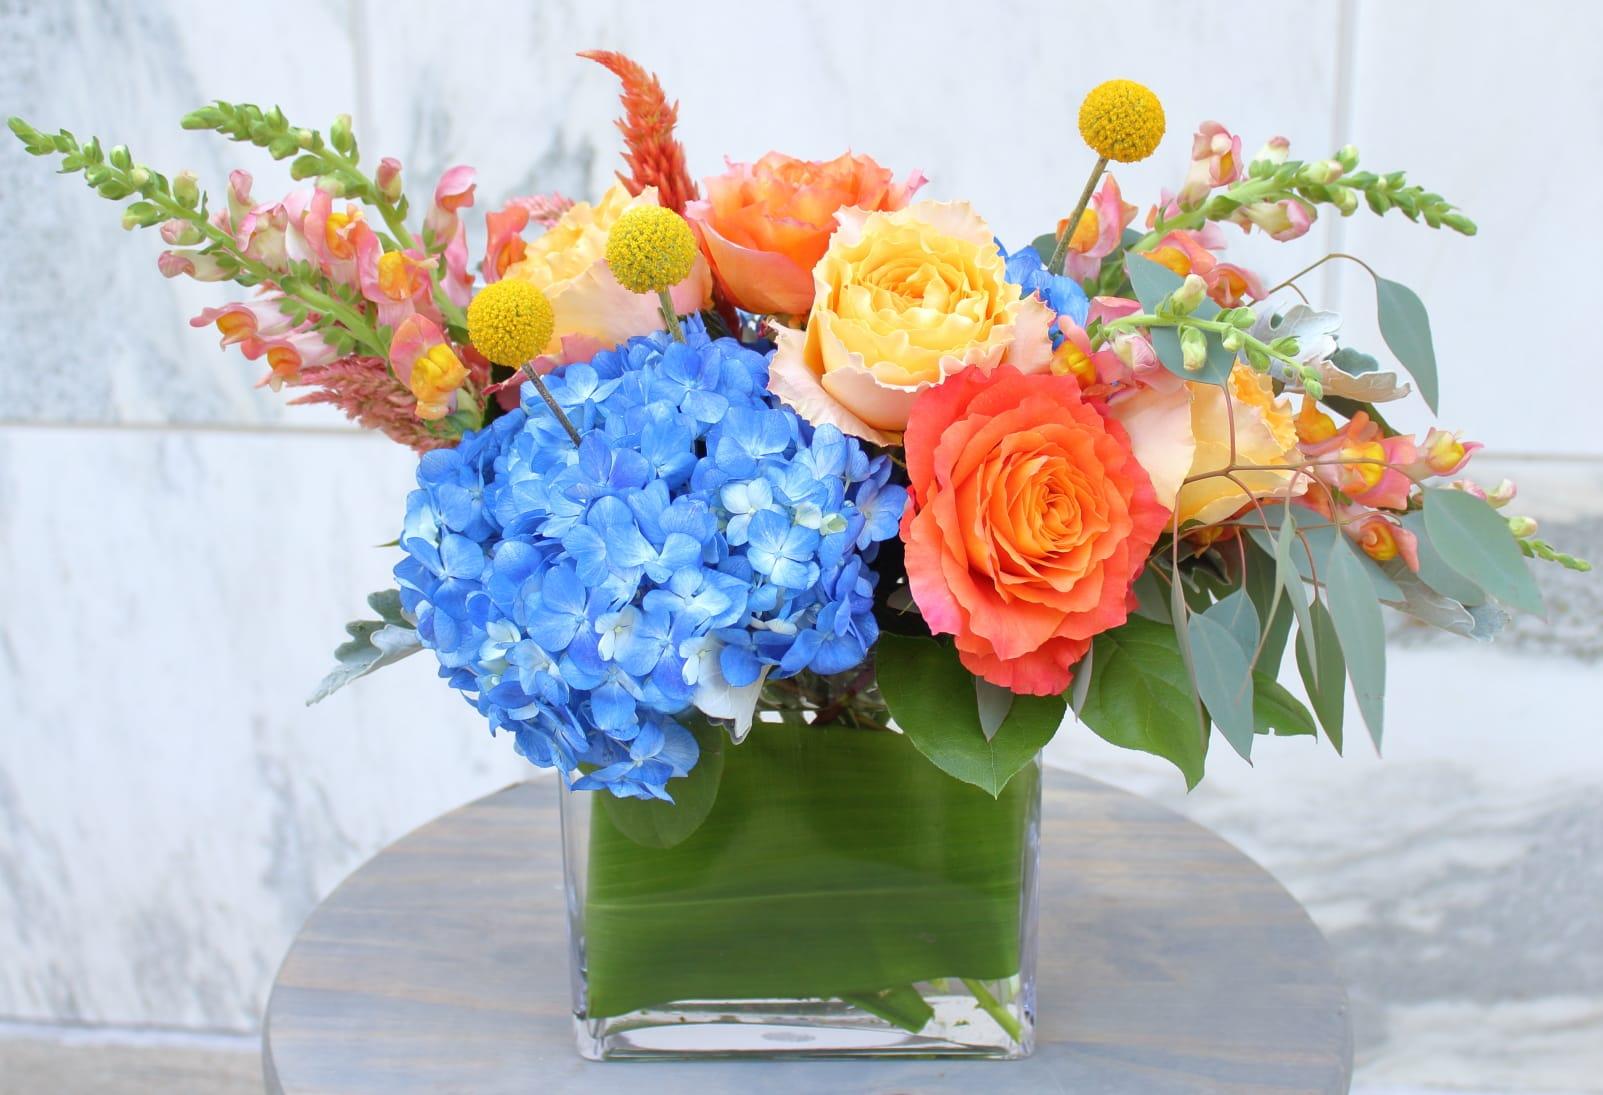 16bb7df8c41 https   www.bloomnation.com florist abbeville-florist-gifts  https   res ...